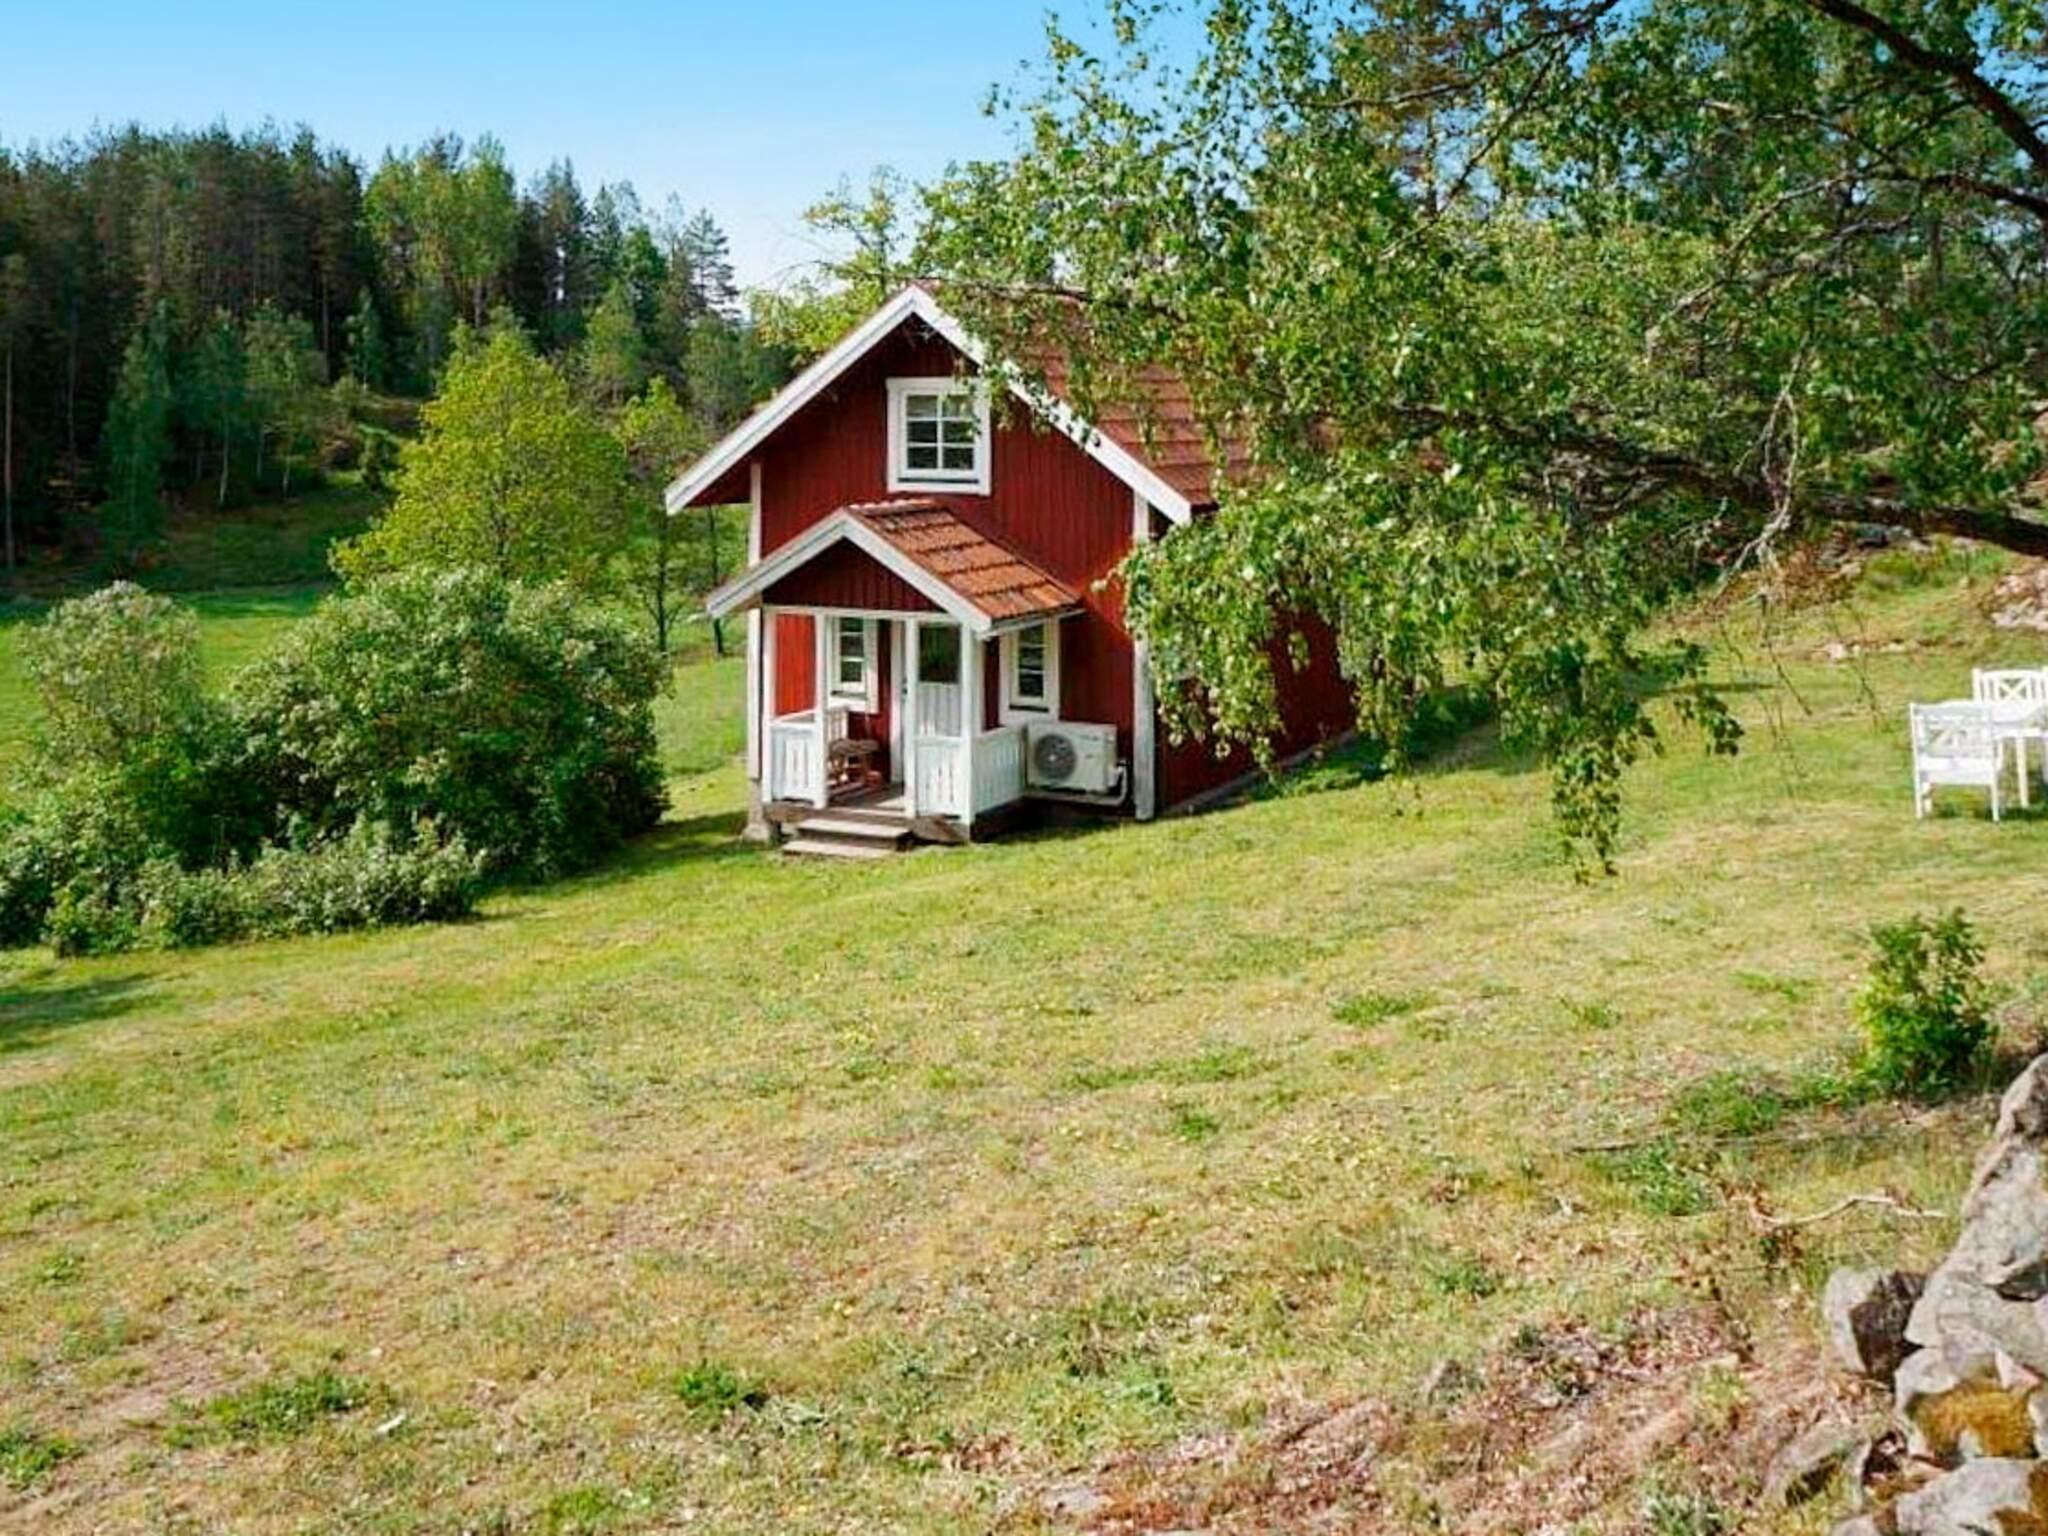 Ferienhaus Valdemarsvik (2634204), Valdemarsvik, Östergötlands län, Südschweden, Schweden, Bild 21